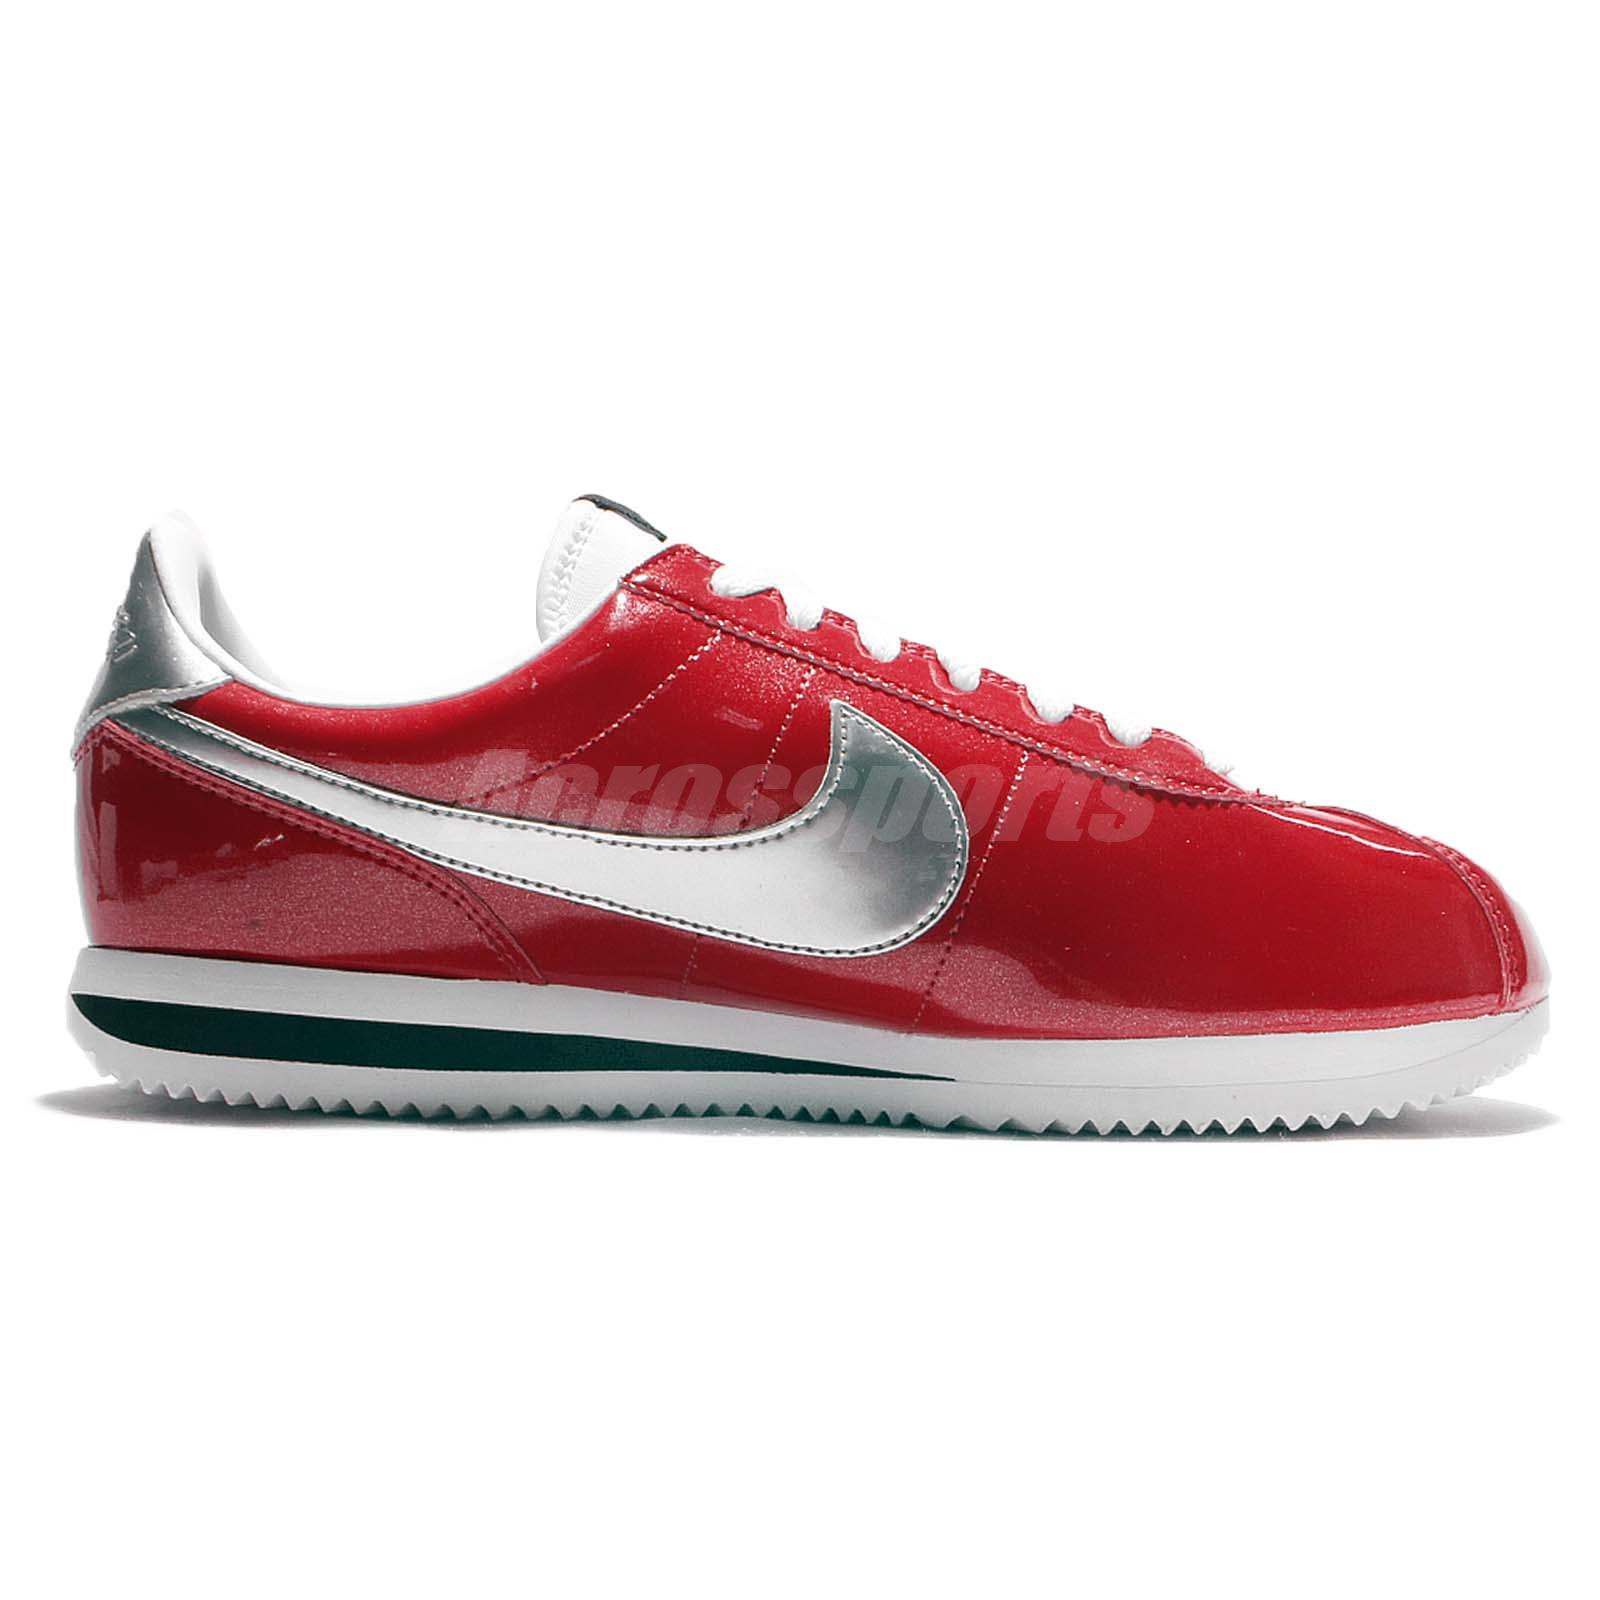 Nike Cortez Basic PREM QS Red White Patent Leather Mens